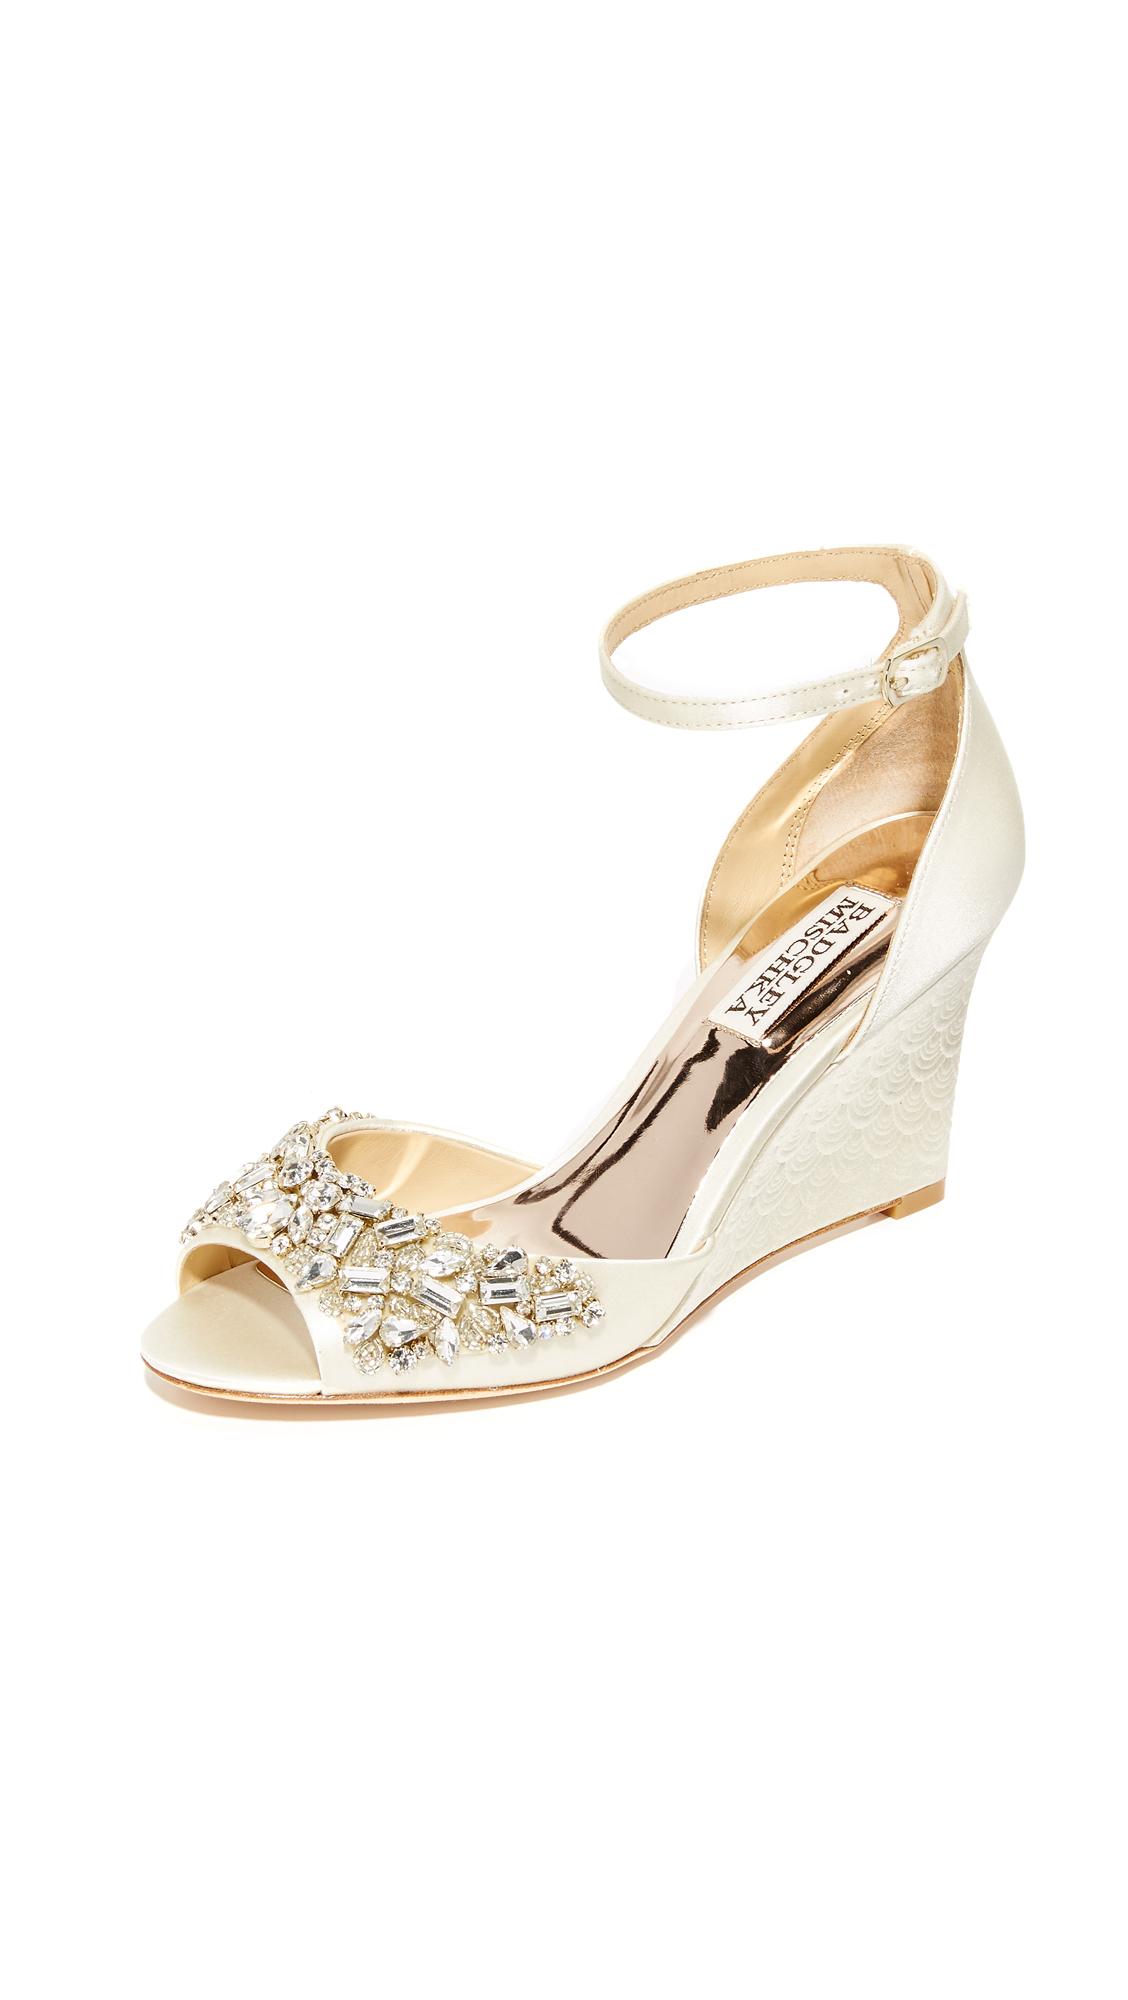 Photo of Badgley Mischka Barbara Wedge Sandals Ivory - Badgley Mischka online